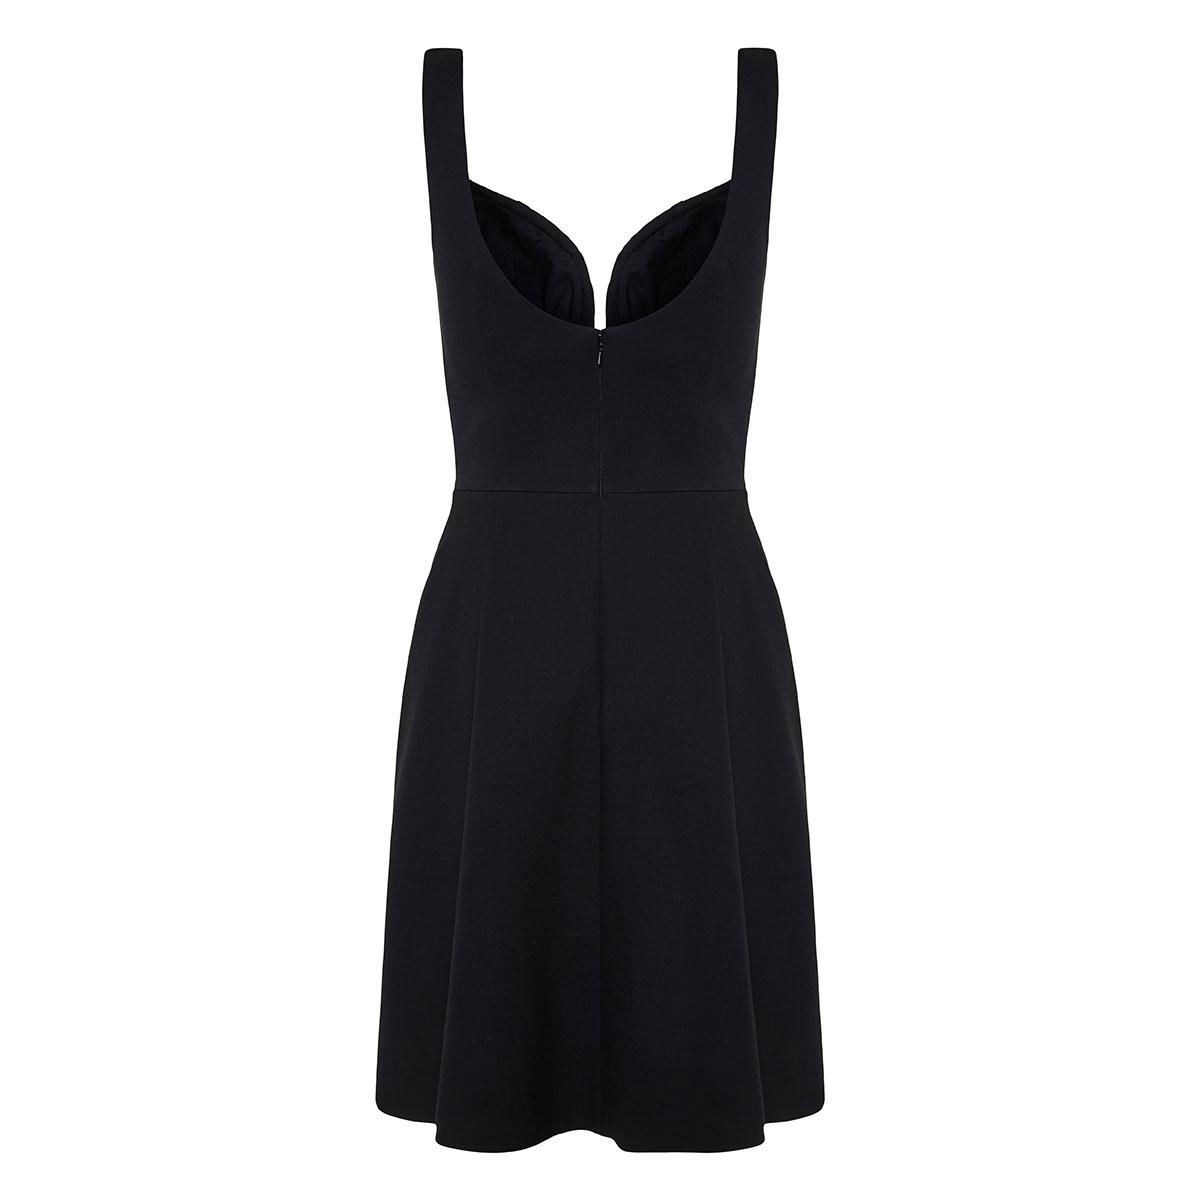 Asymmetric corset dress